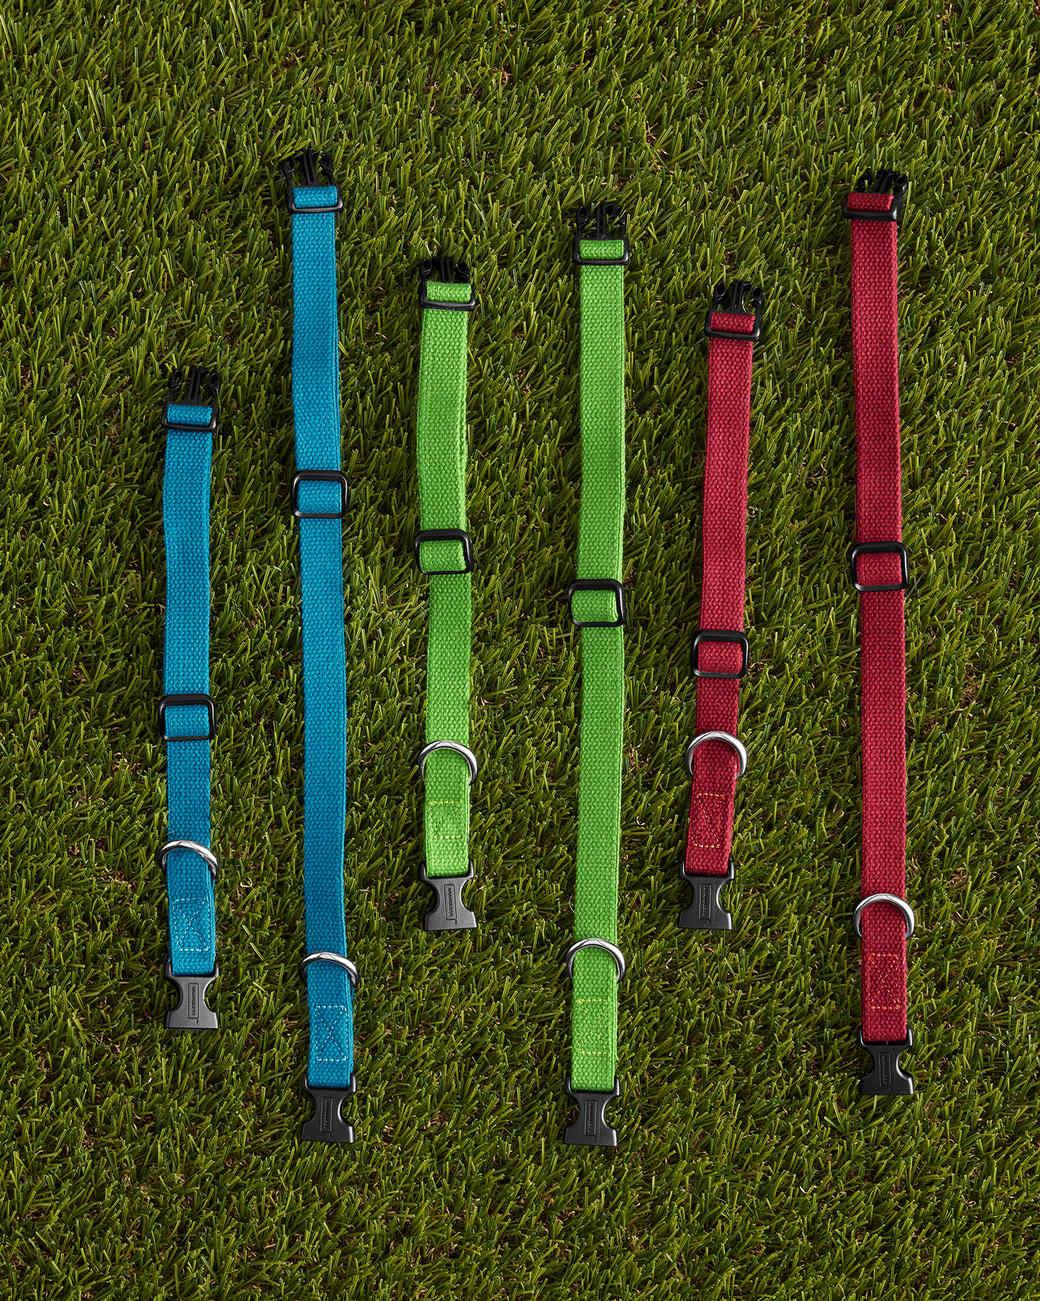 brandless-pet-collars-pr-0319